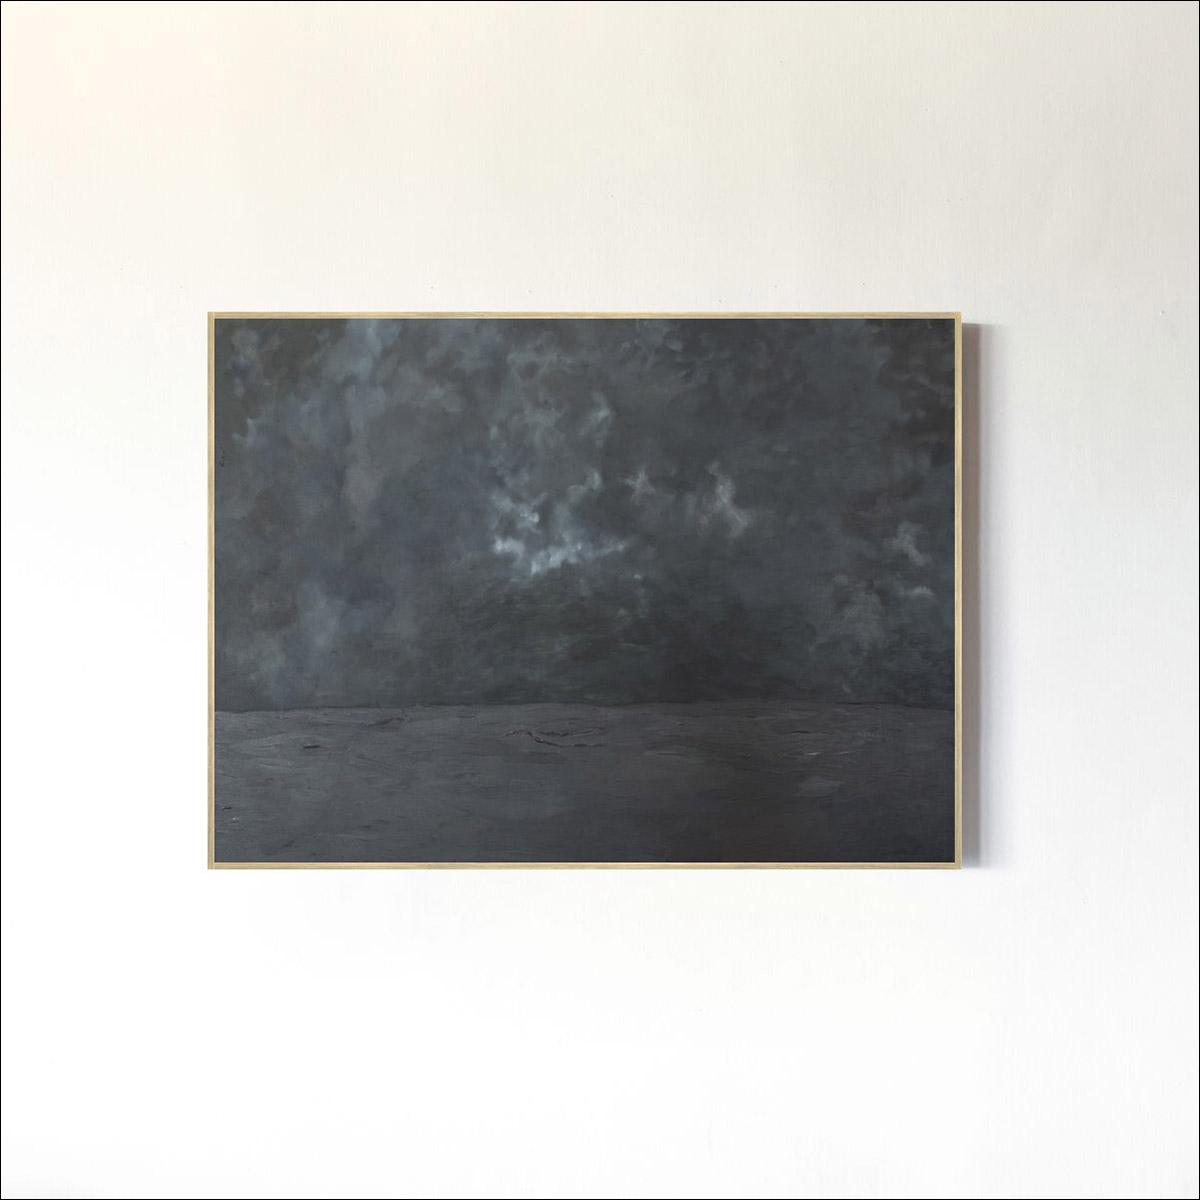 Synograph of _Dark Moon_ by Kali Sanders